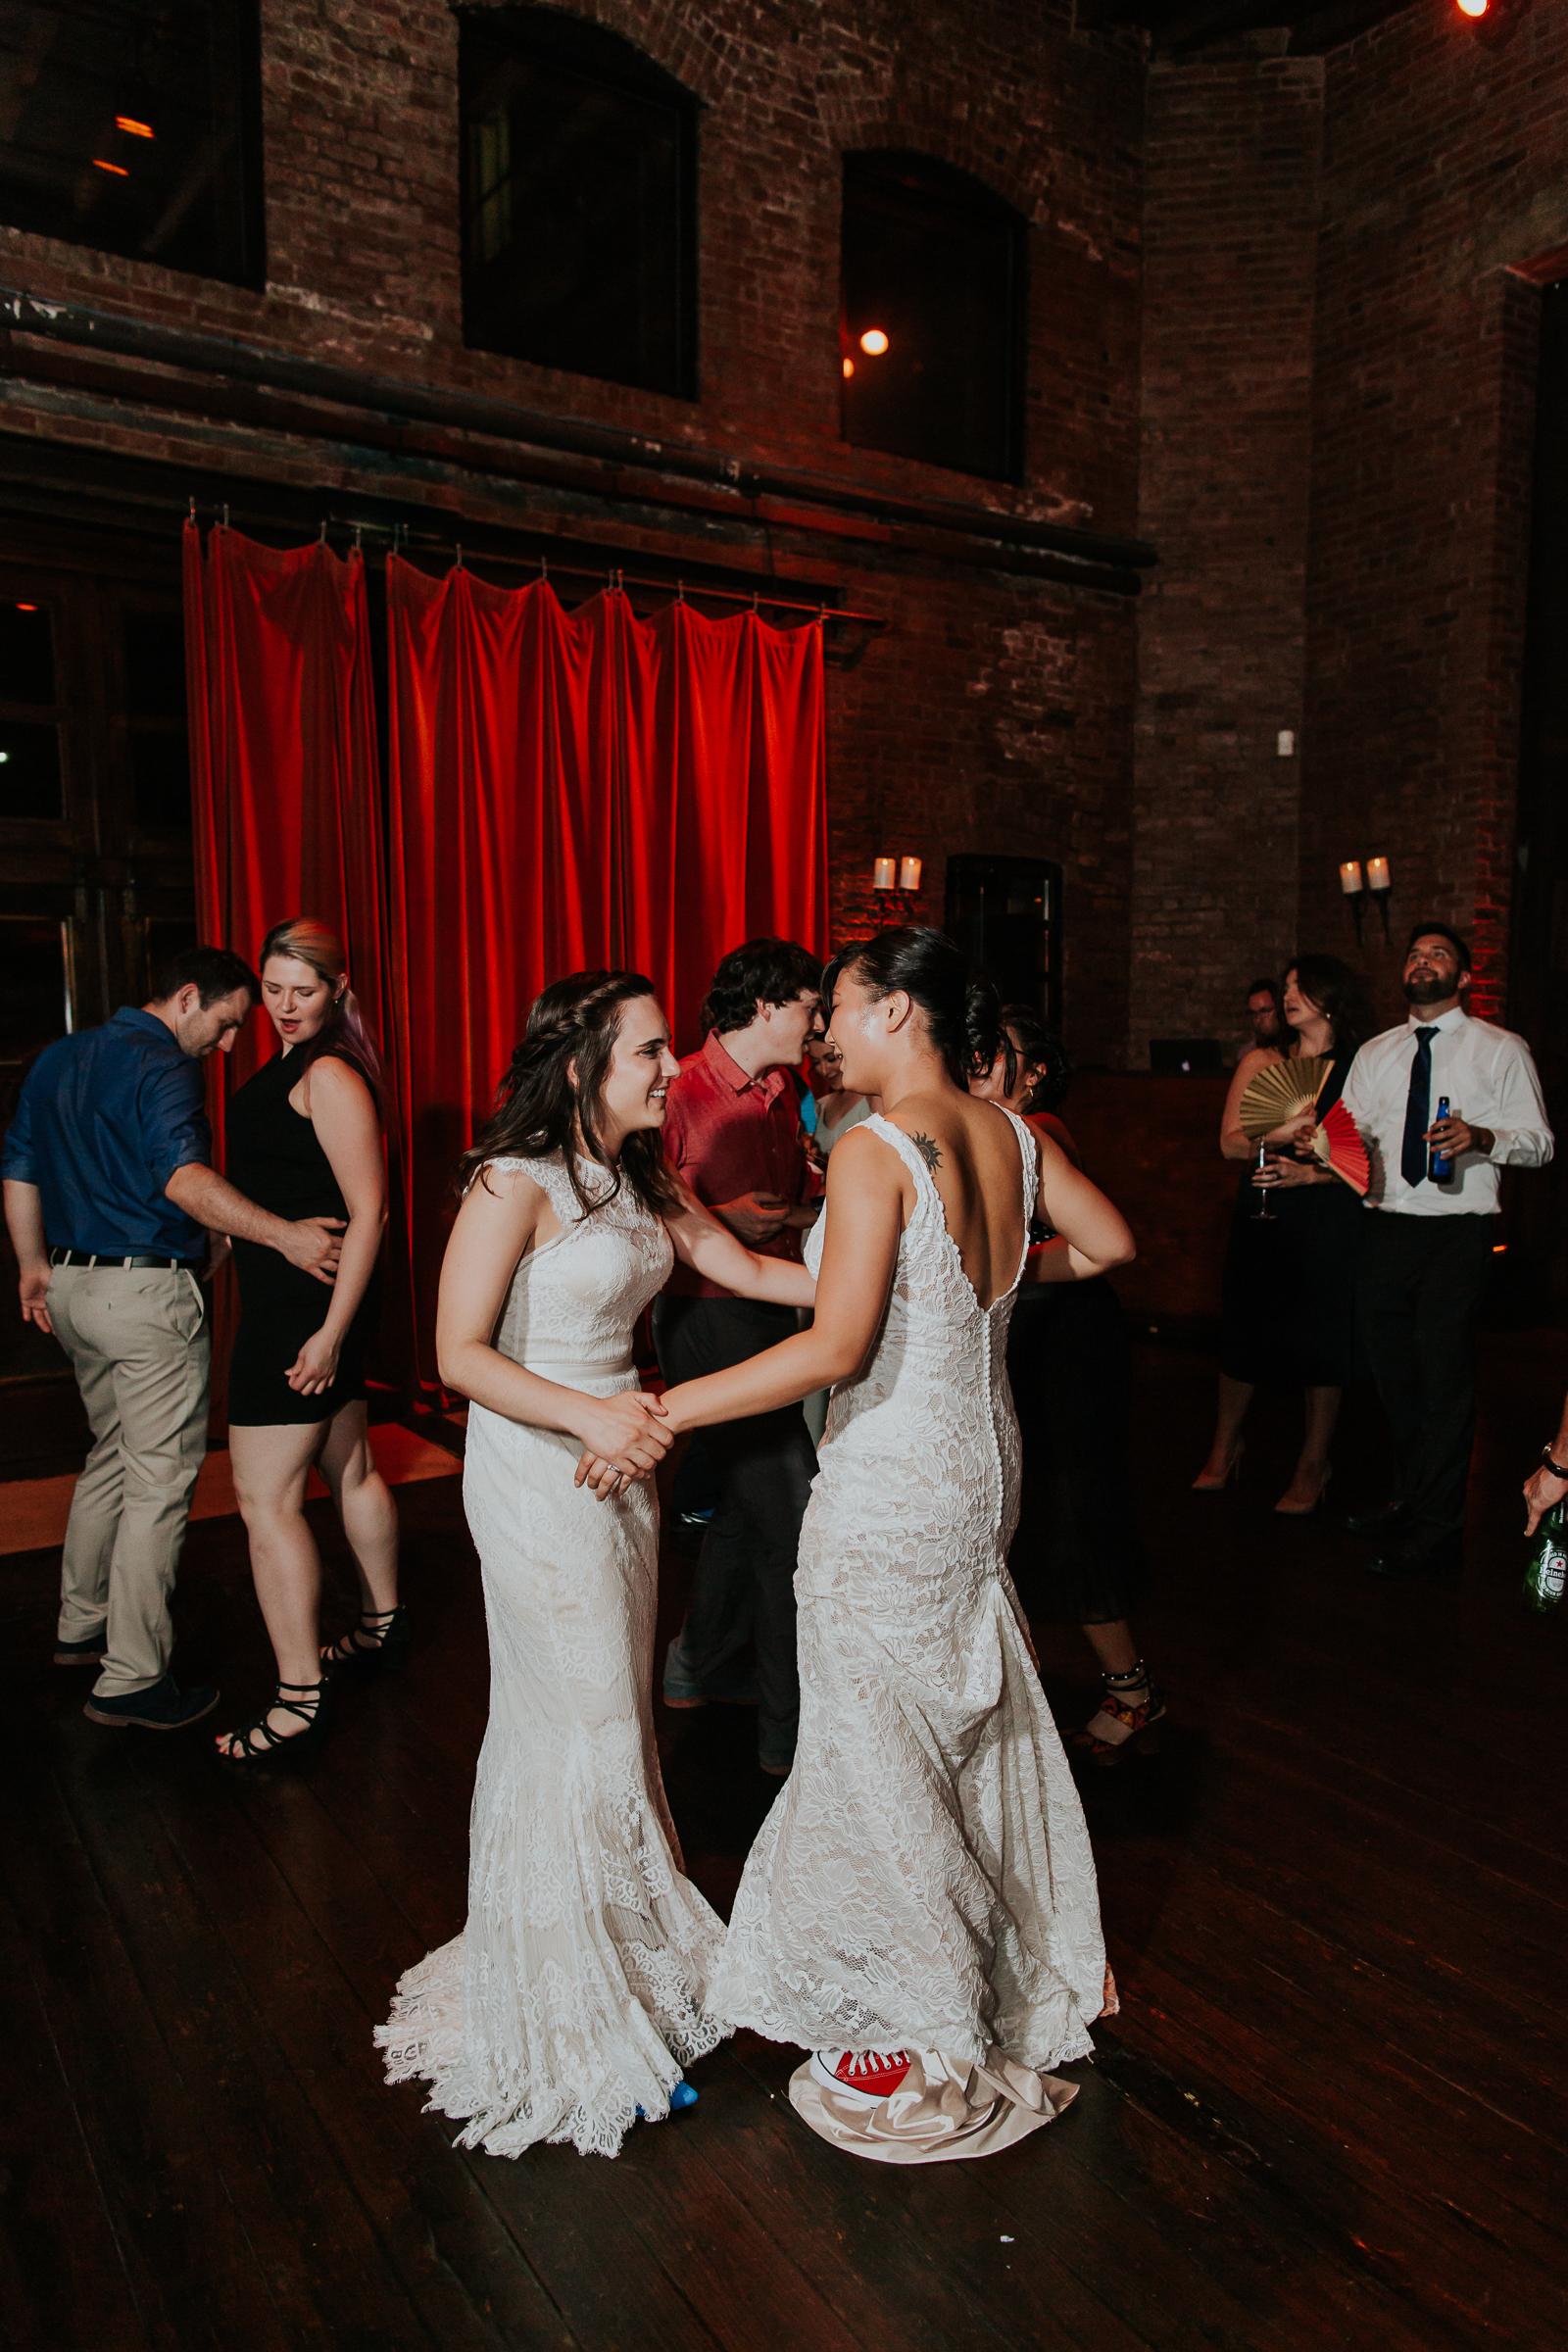 My-Moon-Brooklyn-LGBT-Gay-Documentary-Wedding-Photographer-115.jpg